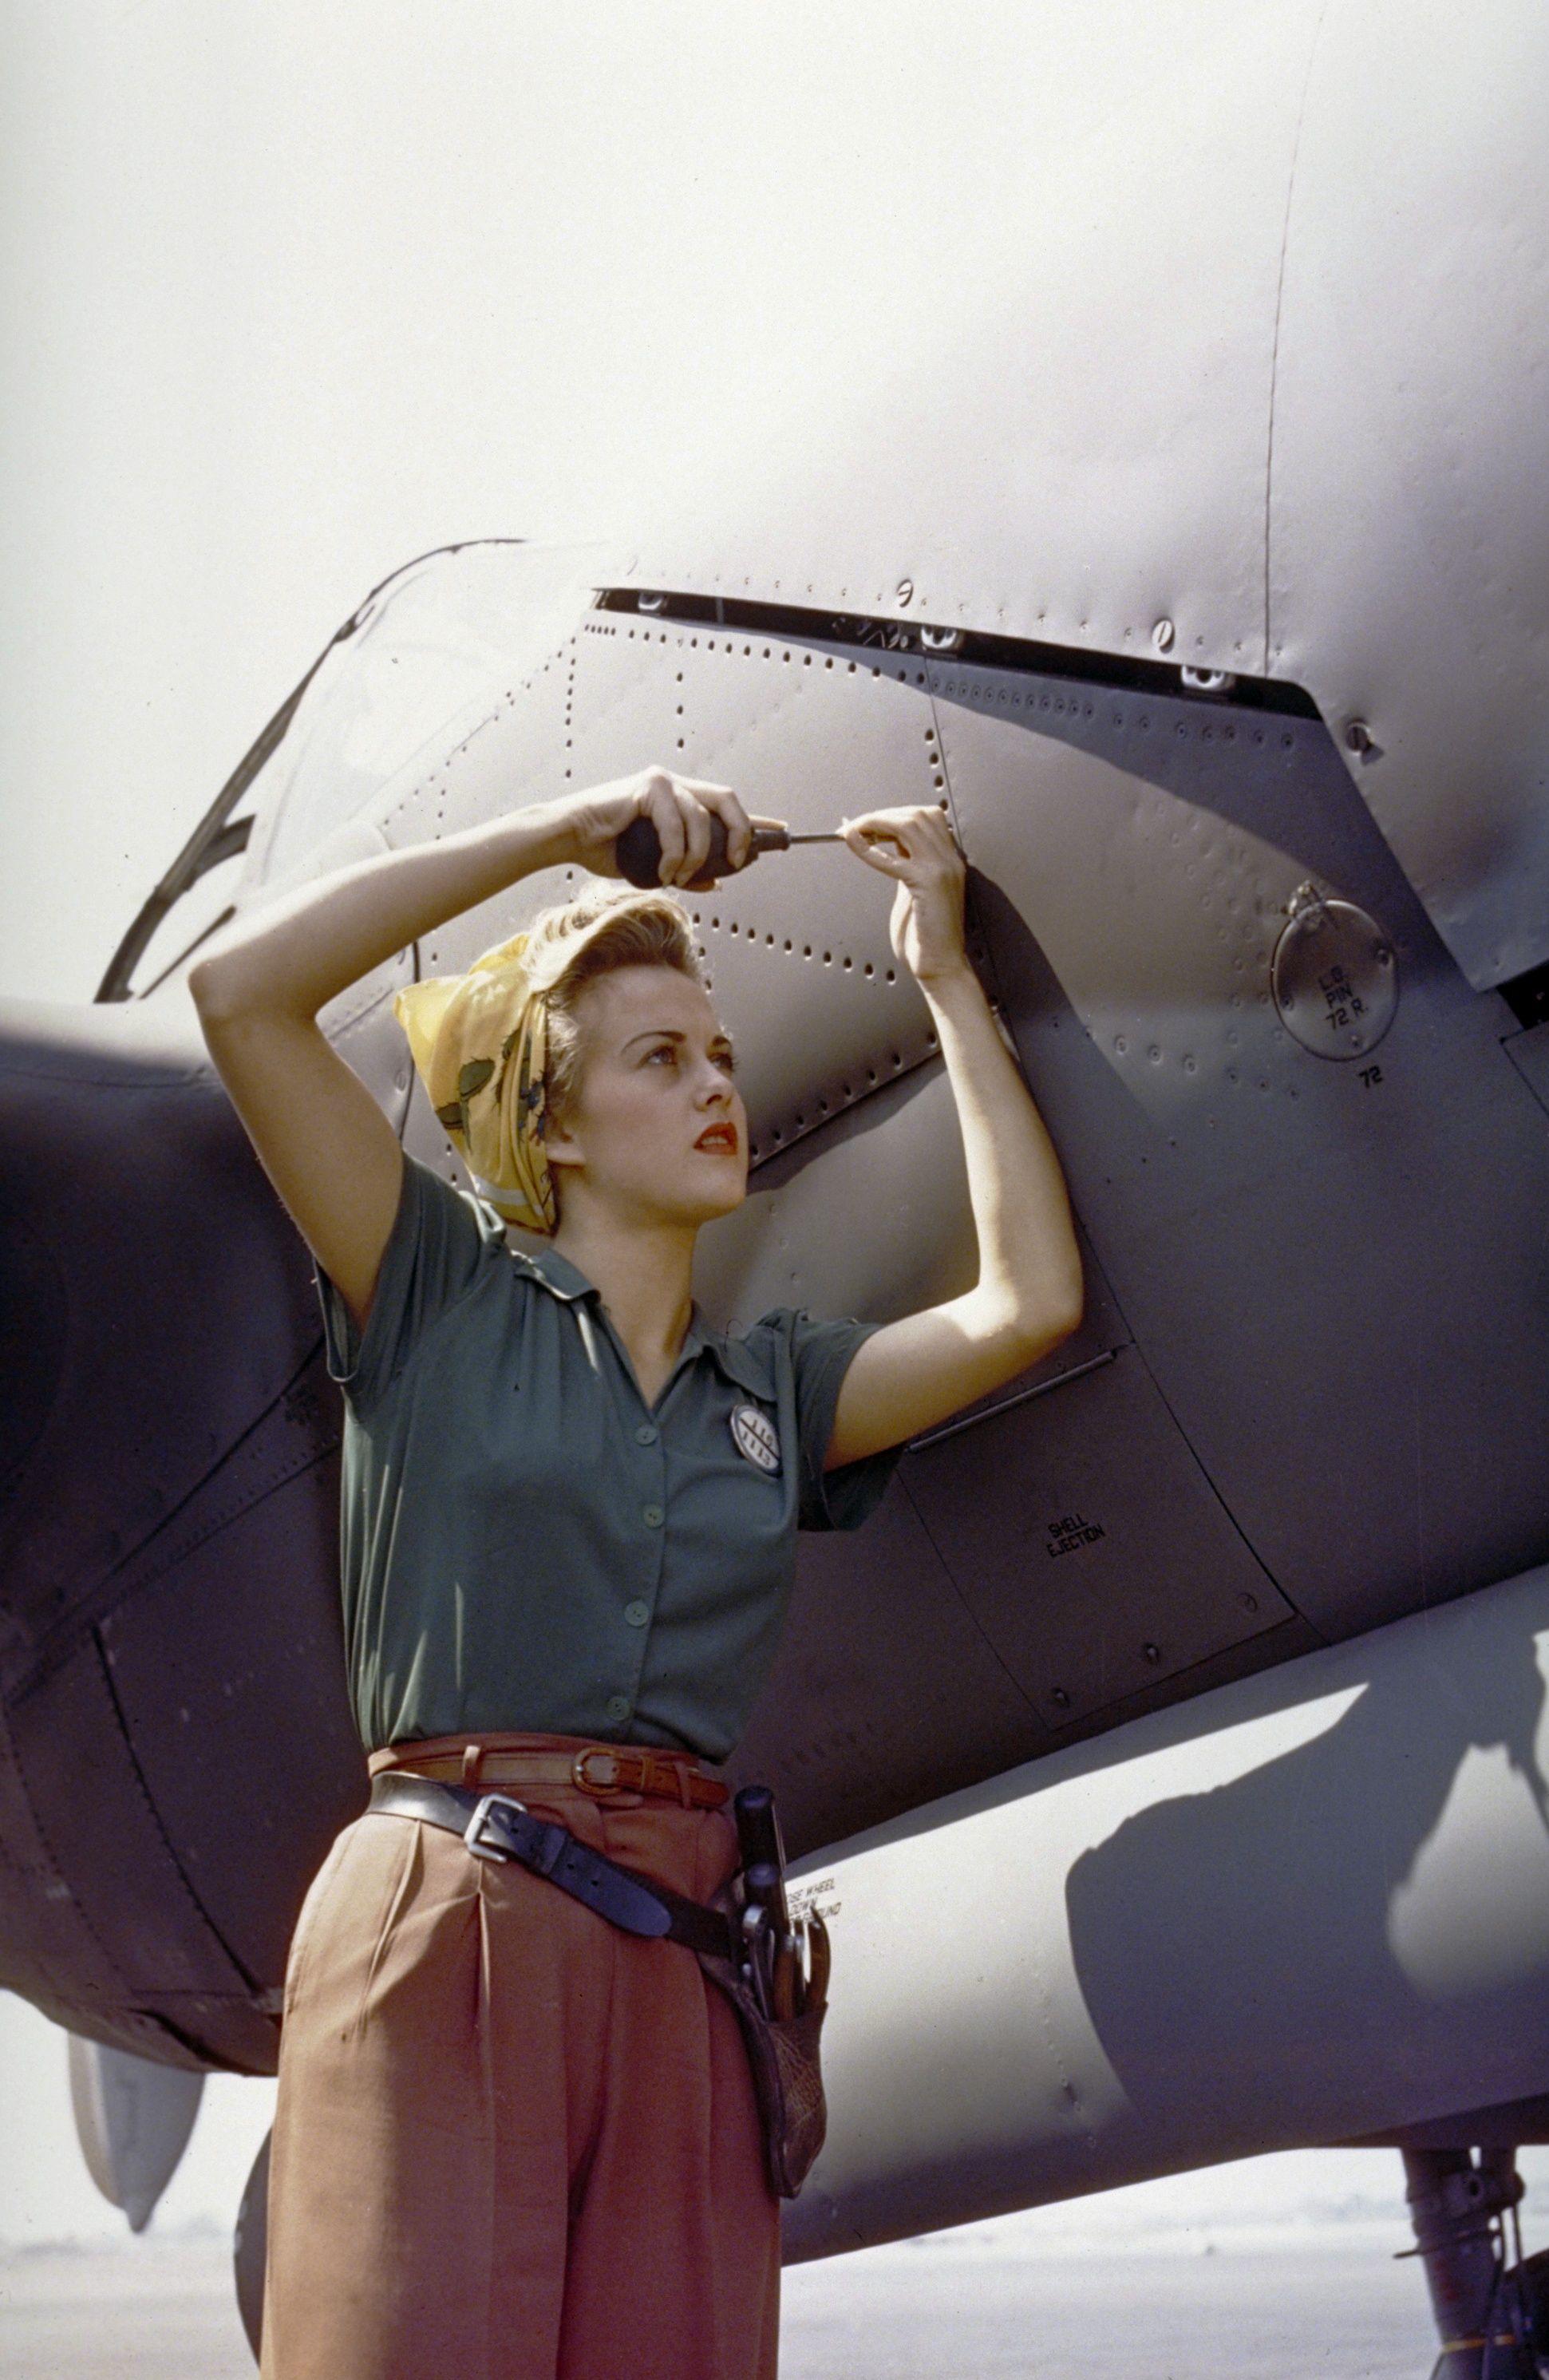 Lockheed female employee works on a P-38 Lighting, Burbank, California - 1944 - Second World War fashion